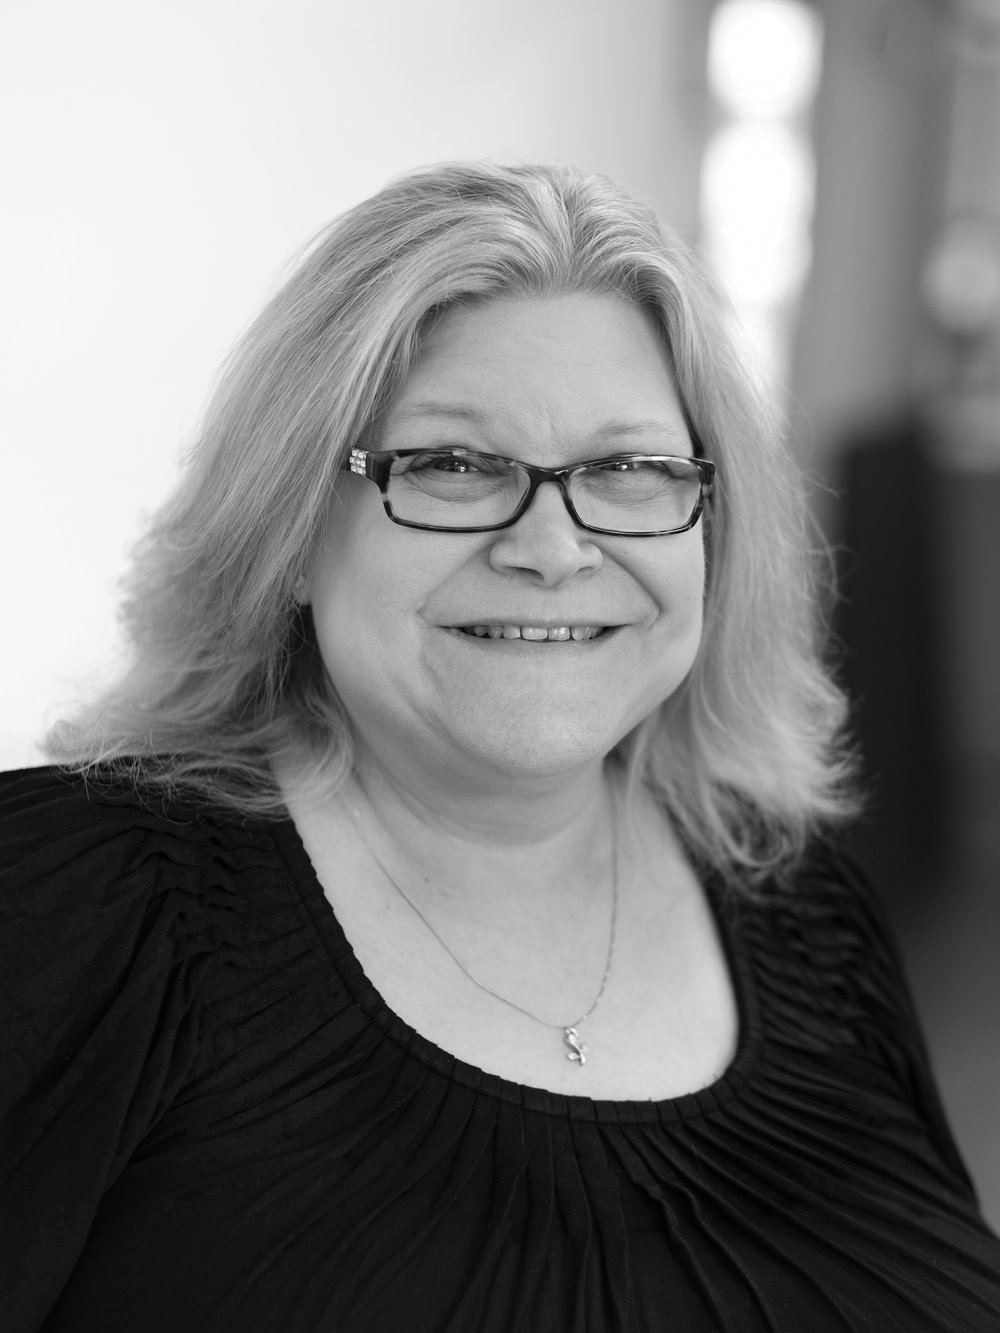 Laurie Kutoroff, Director of Finance & Operations